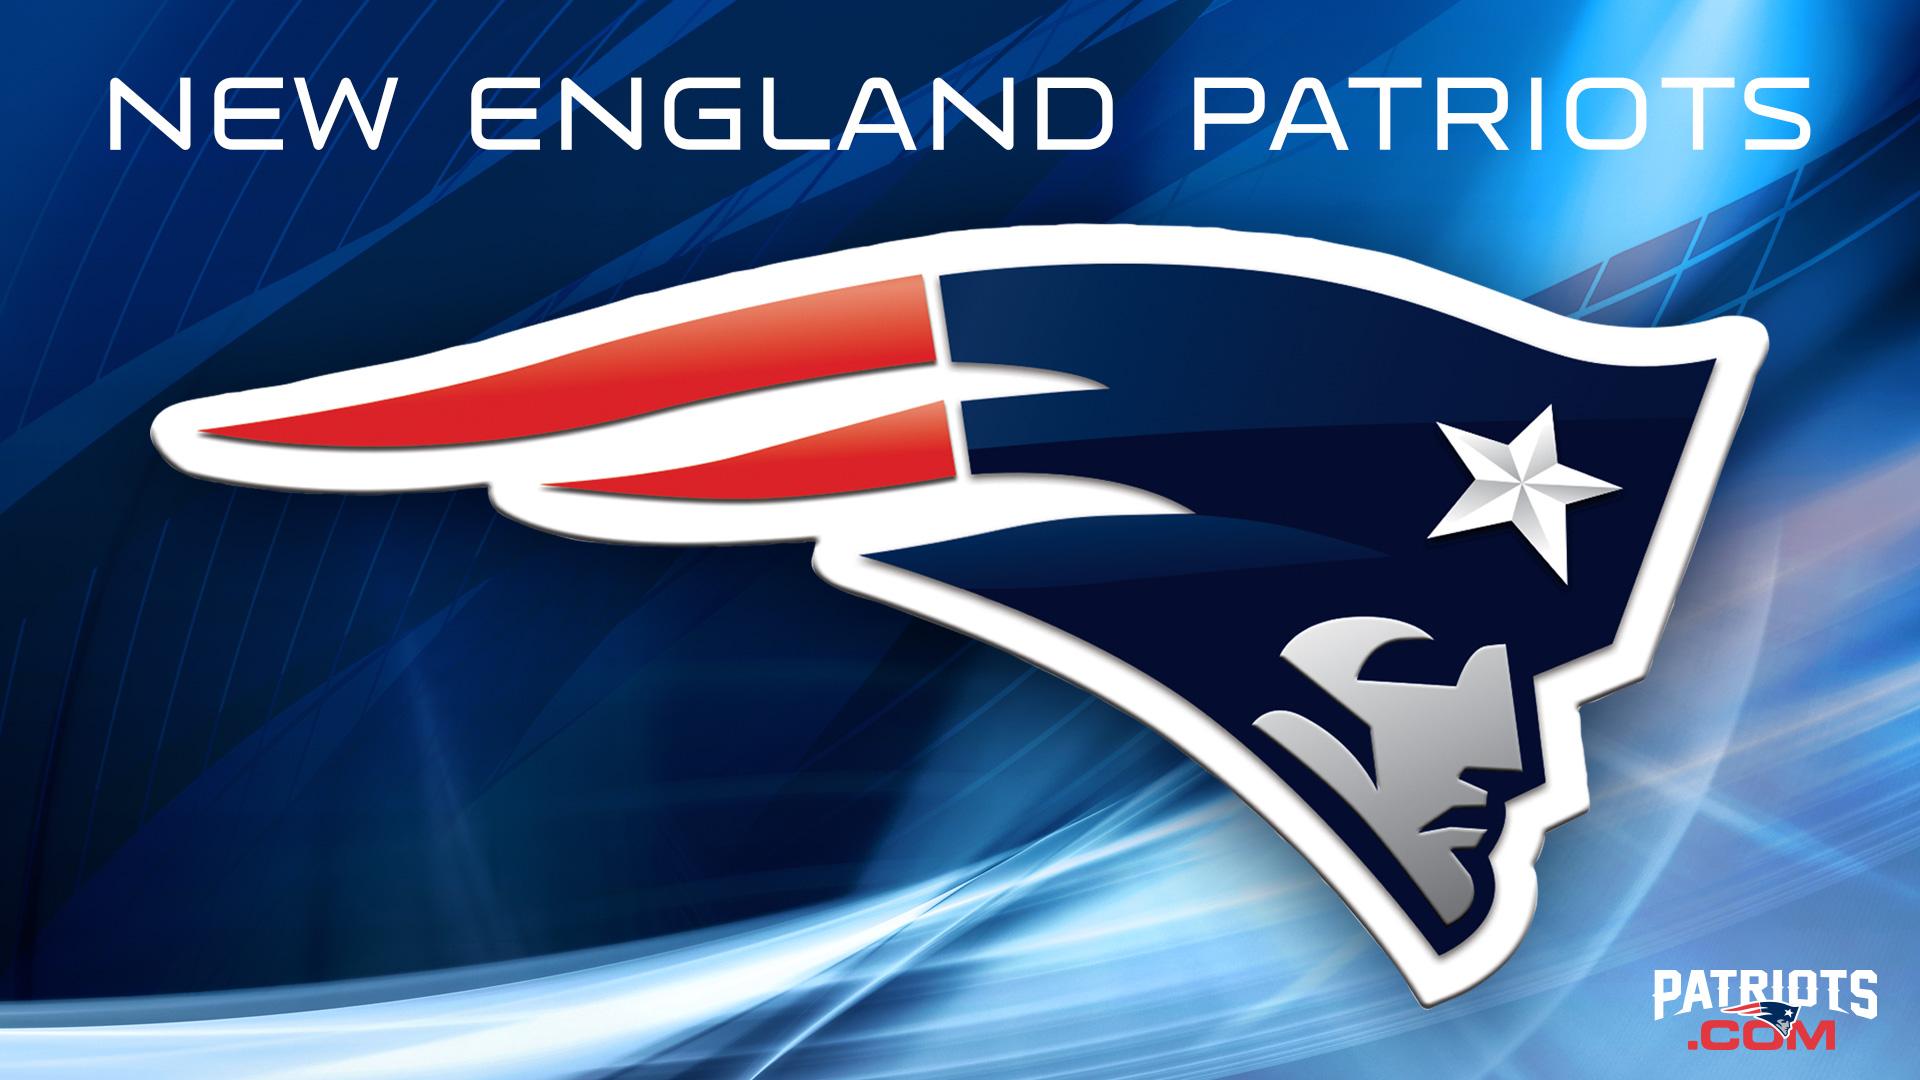 New England Patriots Logo 2017 - HD Wallpaper